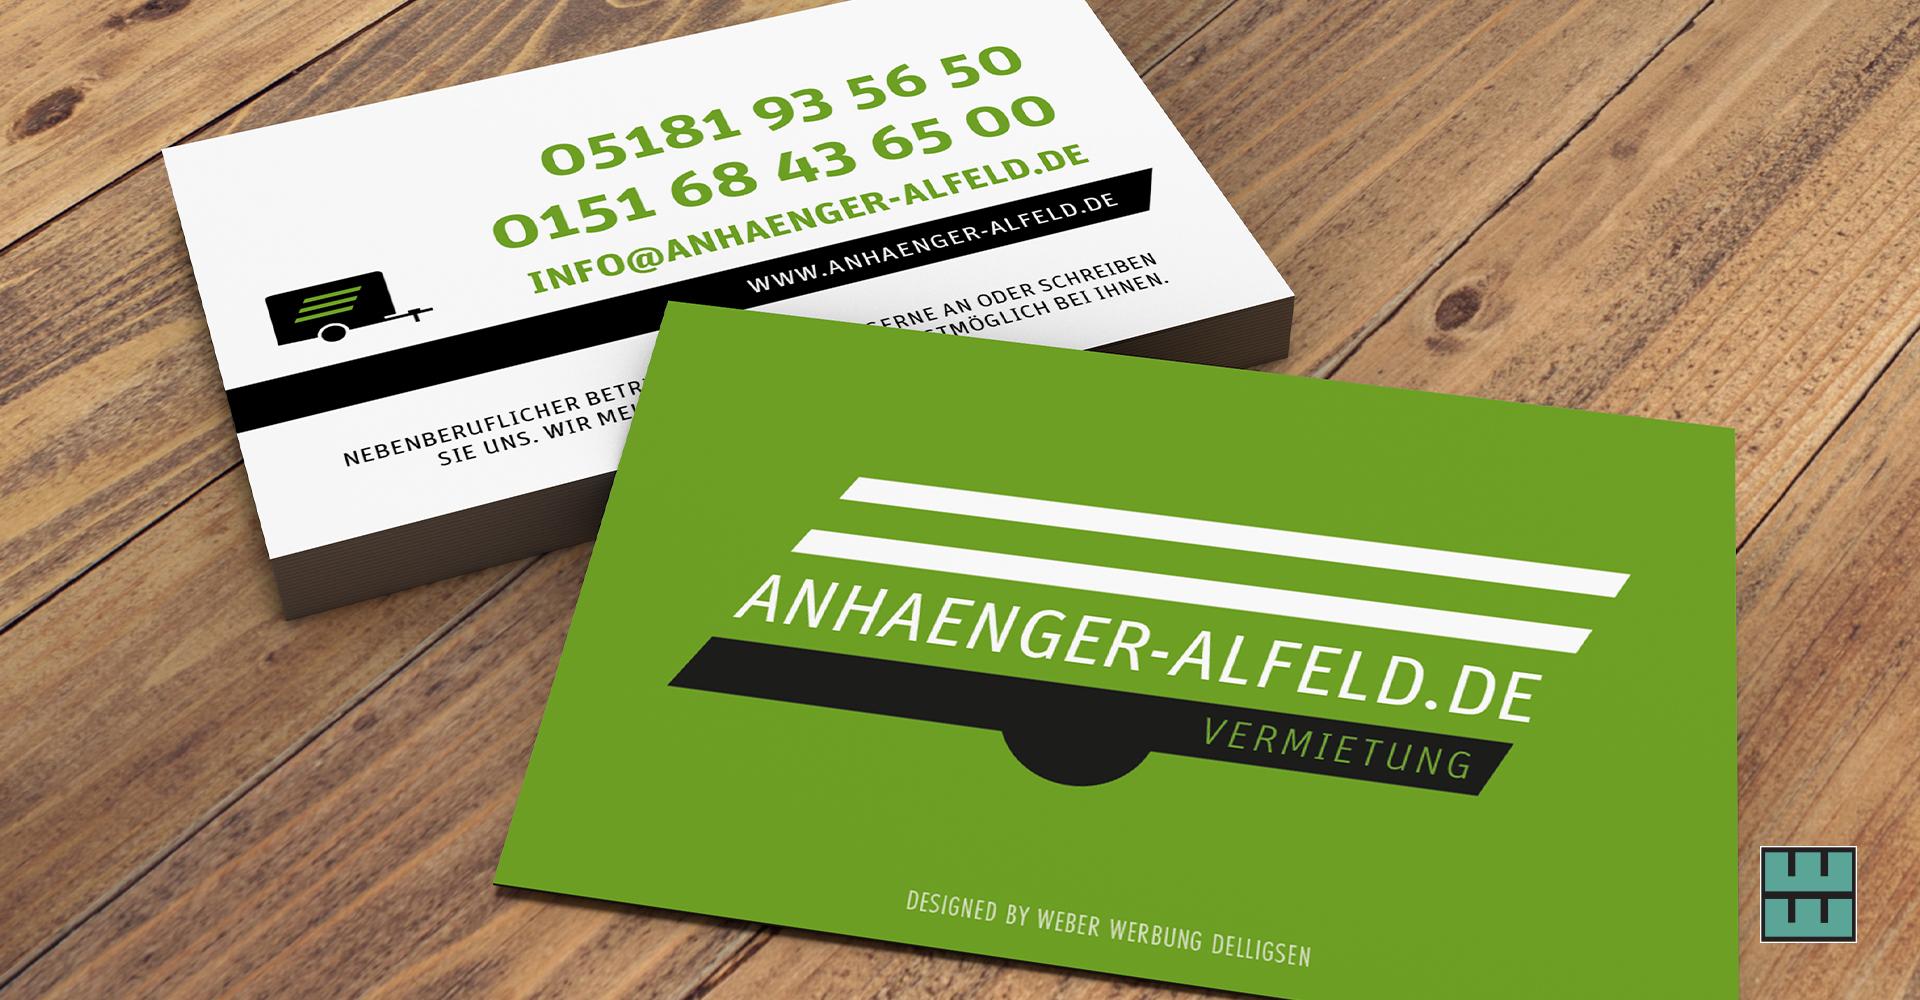 Visitenkarten-Gestaltung für Anhänger-Alfeld.de